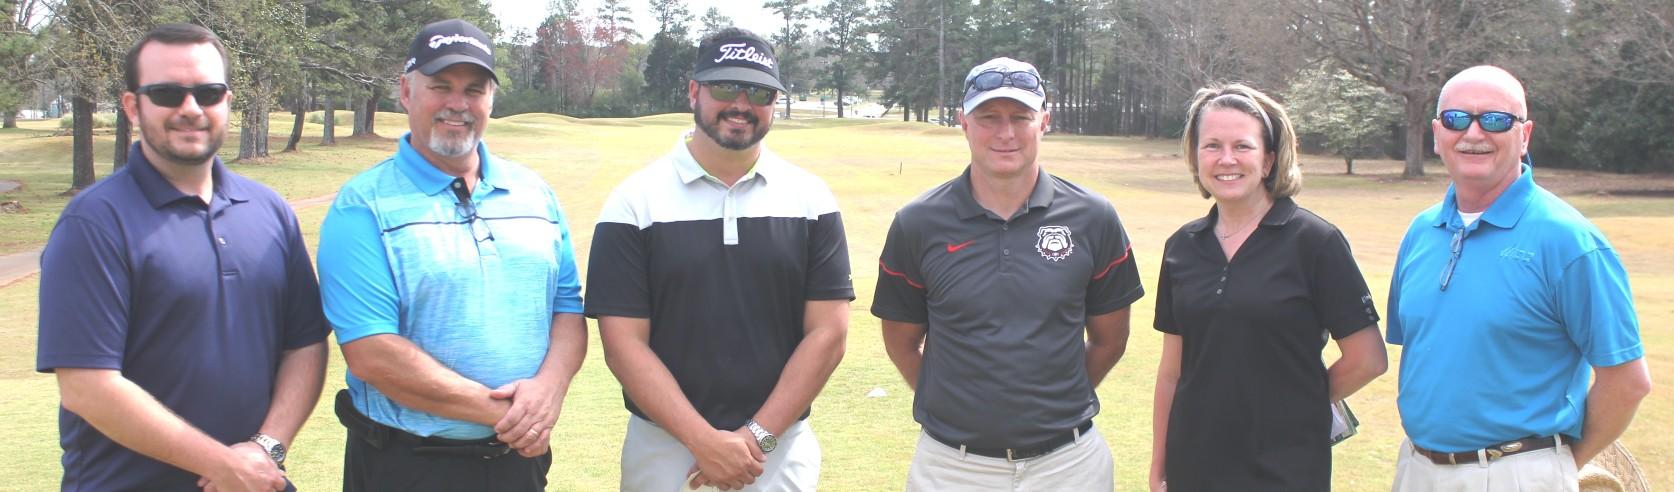 2nd-place-team-for-golf.JPG-w1674.jpg